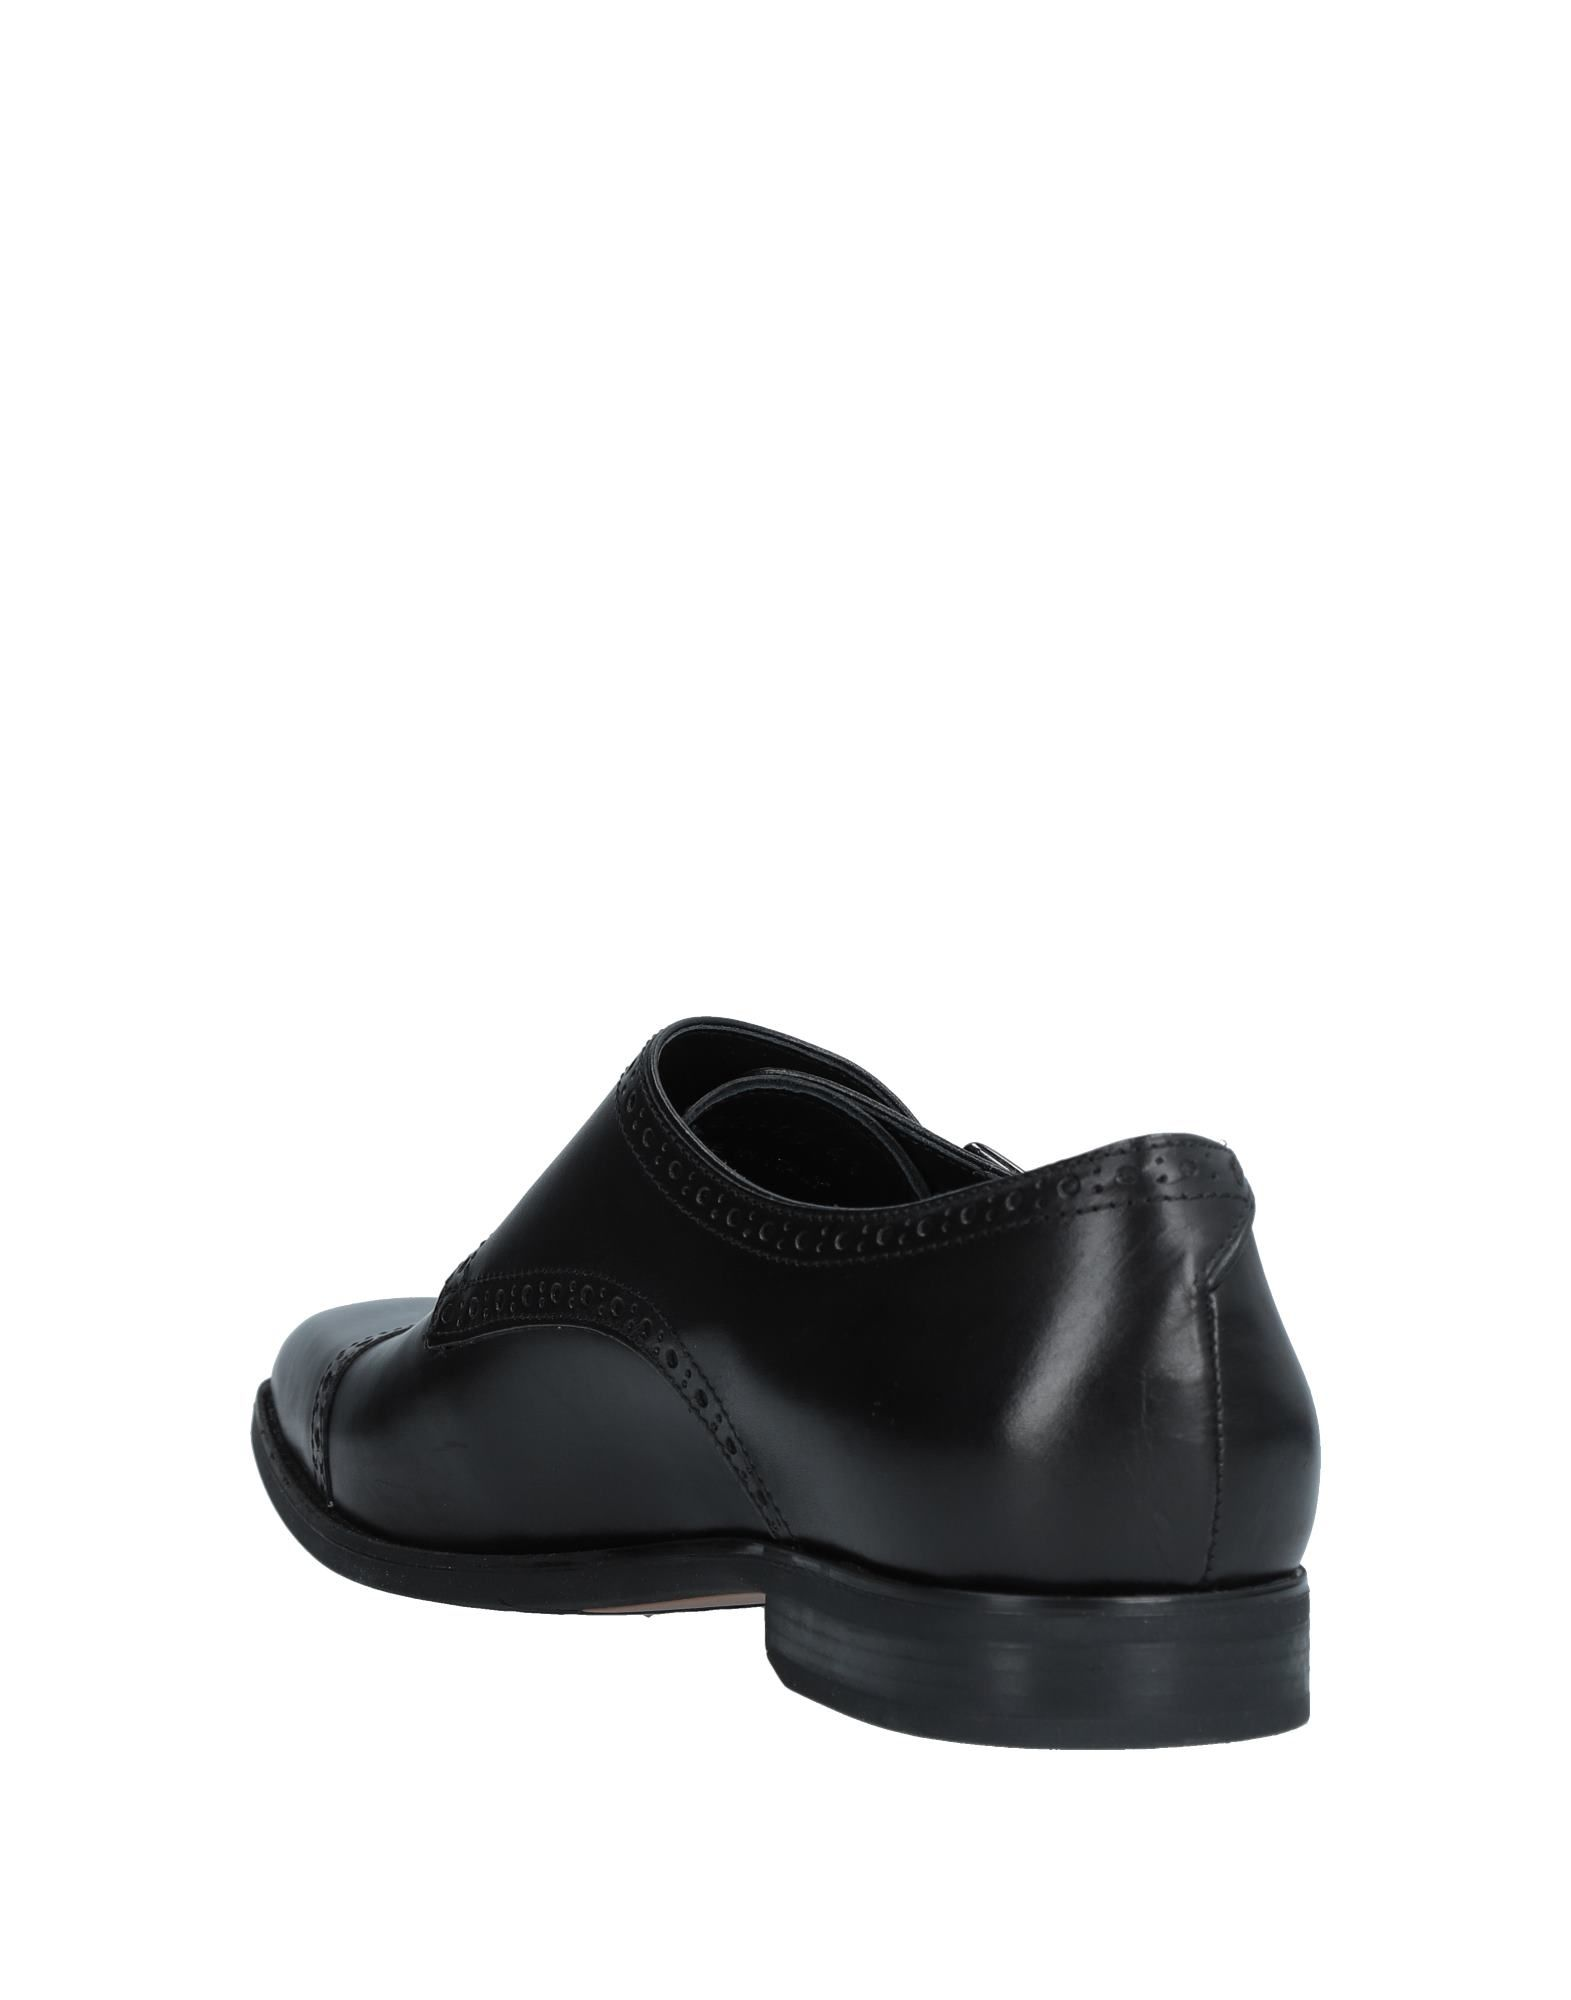 Rabatt echte  Schuhe Geox Mokassins Herren  echte 11539918HQ 63ce31